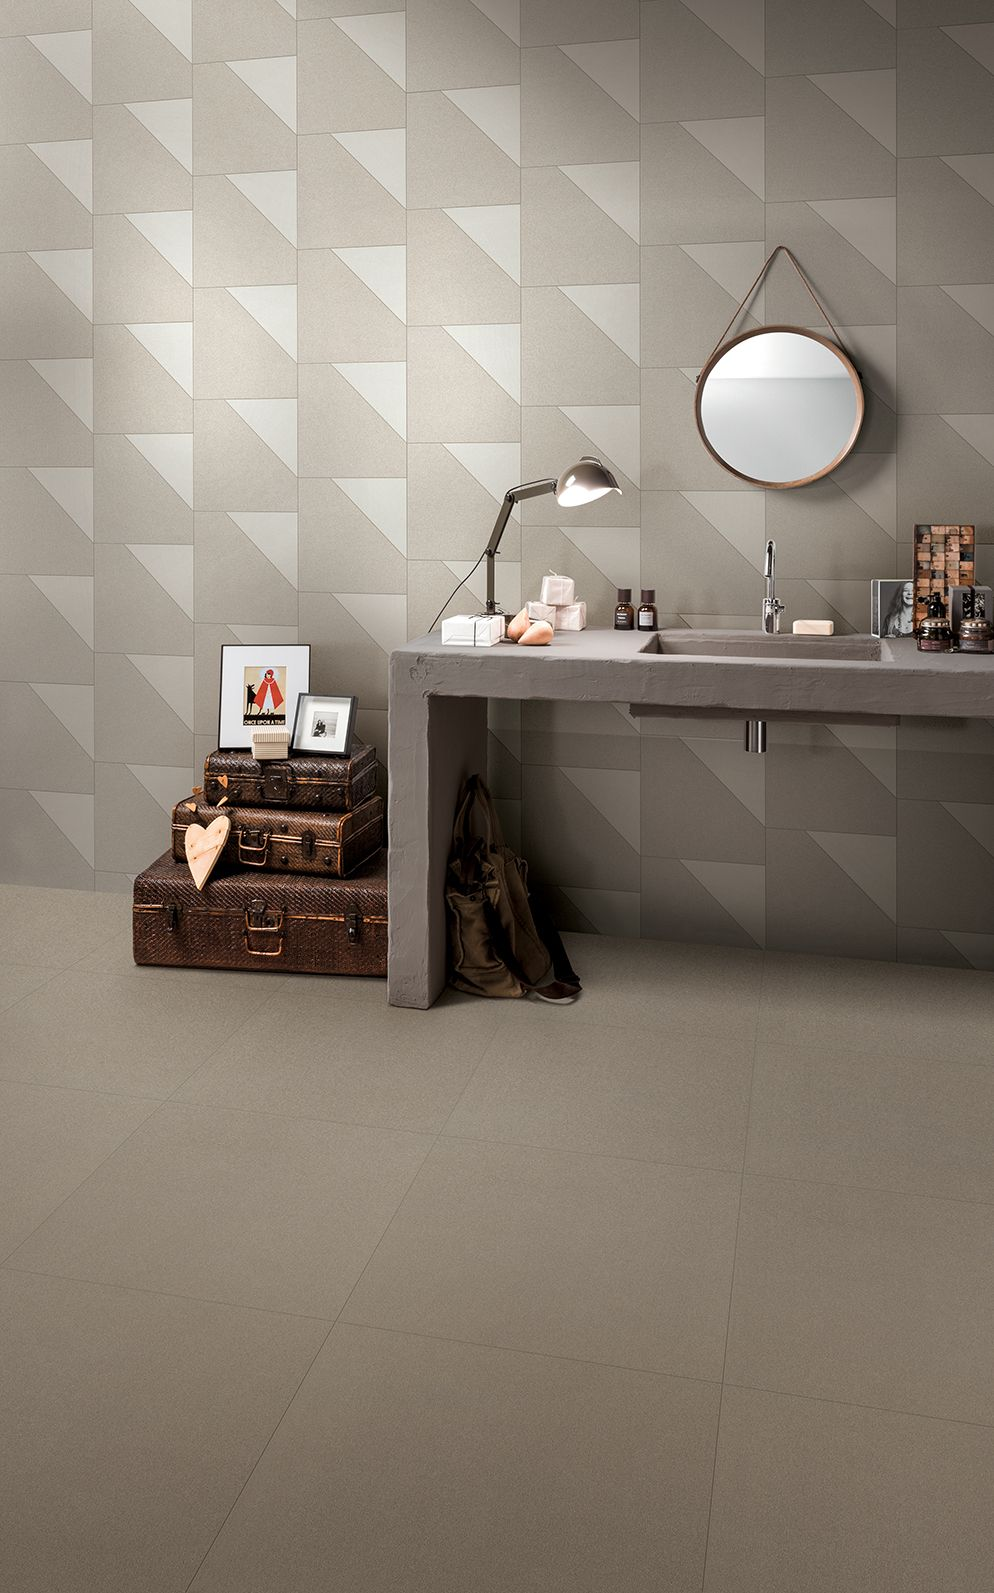 Transition tile ceramic ceramics architecture publicareas transition tile ceramic ceramics architecture publicareas hotel texture doublecrazyfo Choice Image